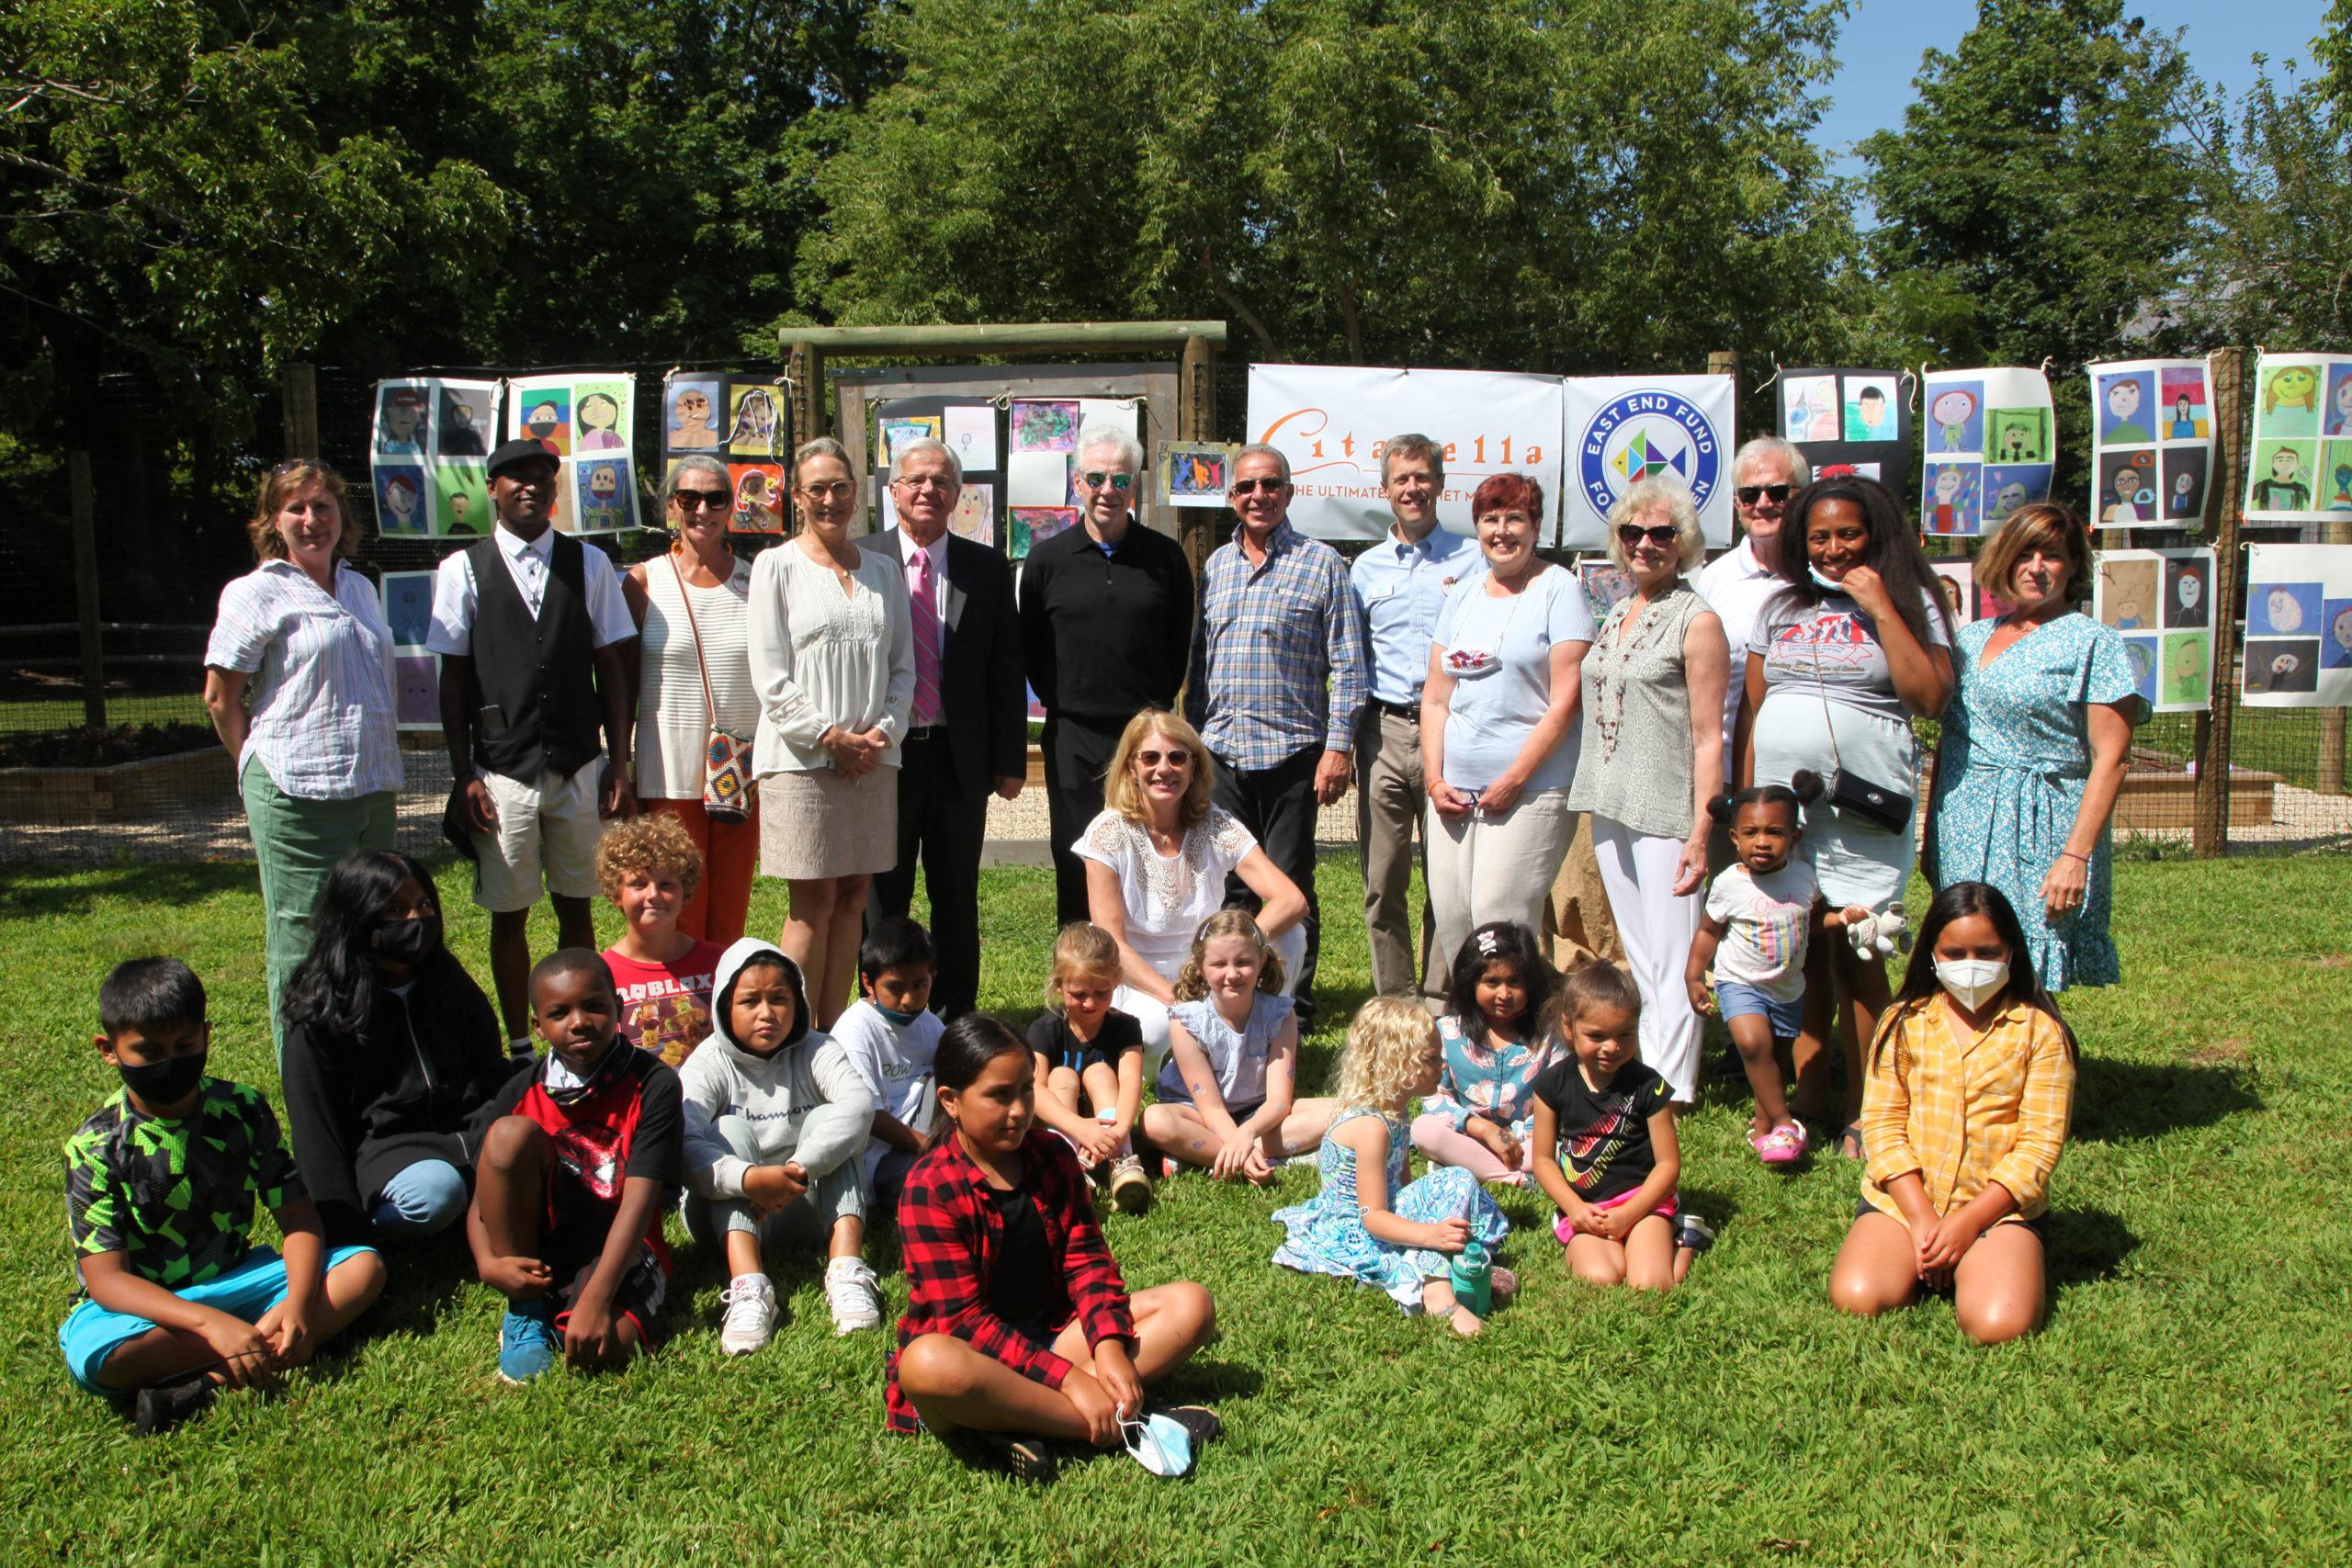 Children and community leaders gather outside Citarella in Bridgehampton to celebrate the launch of the fundraiser.